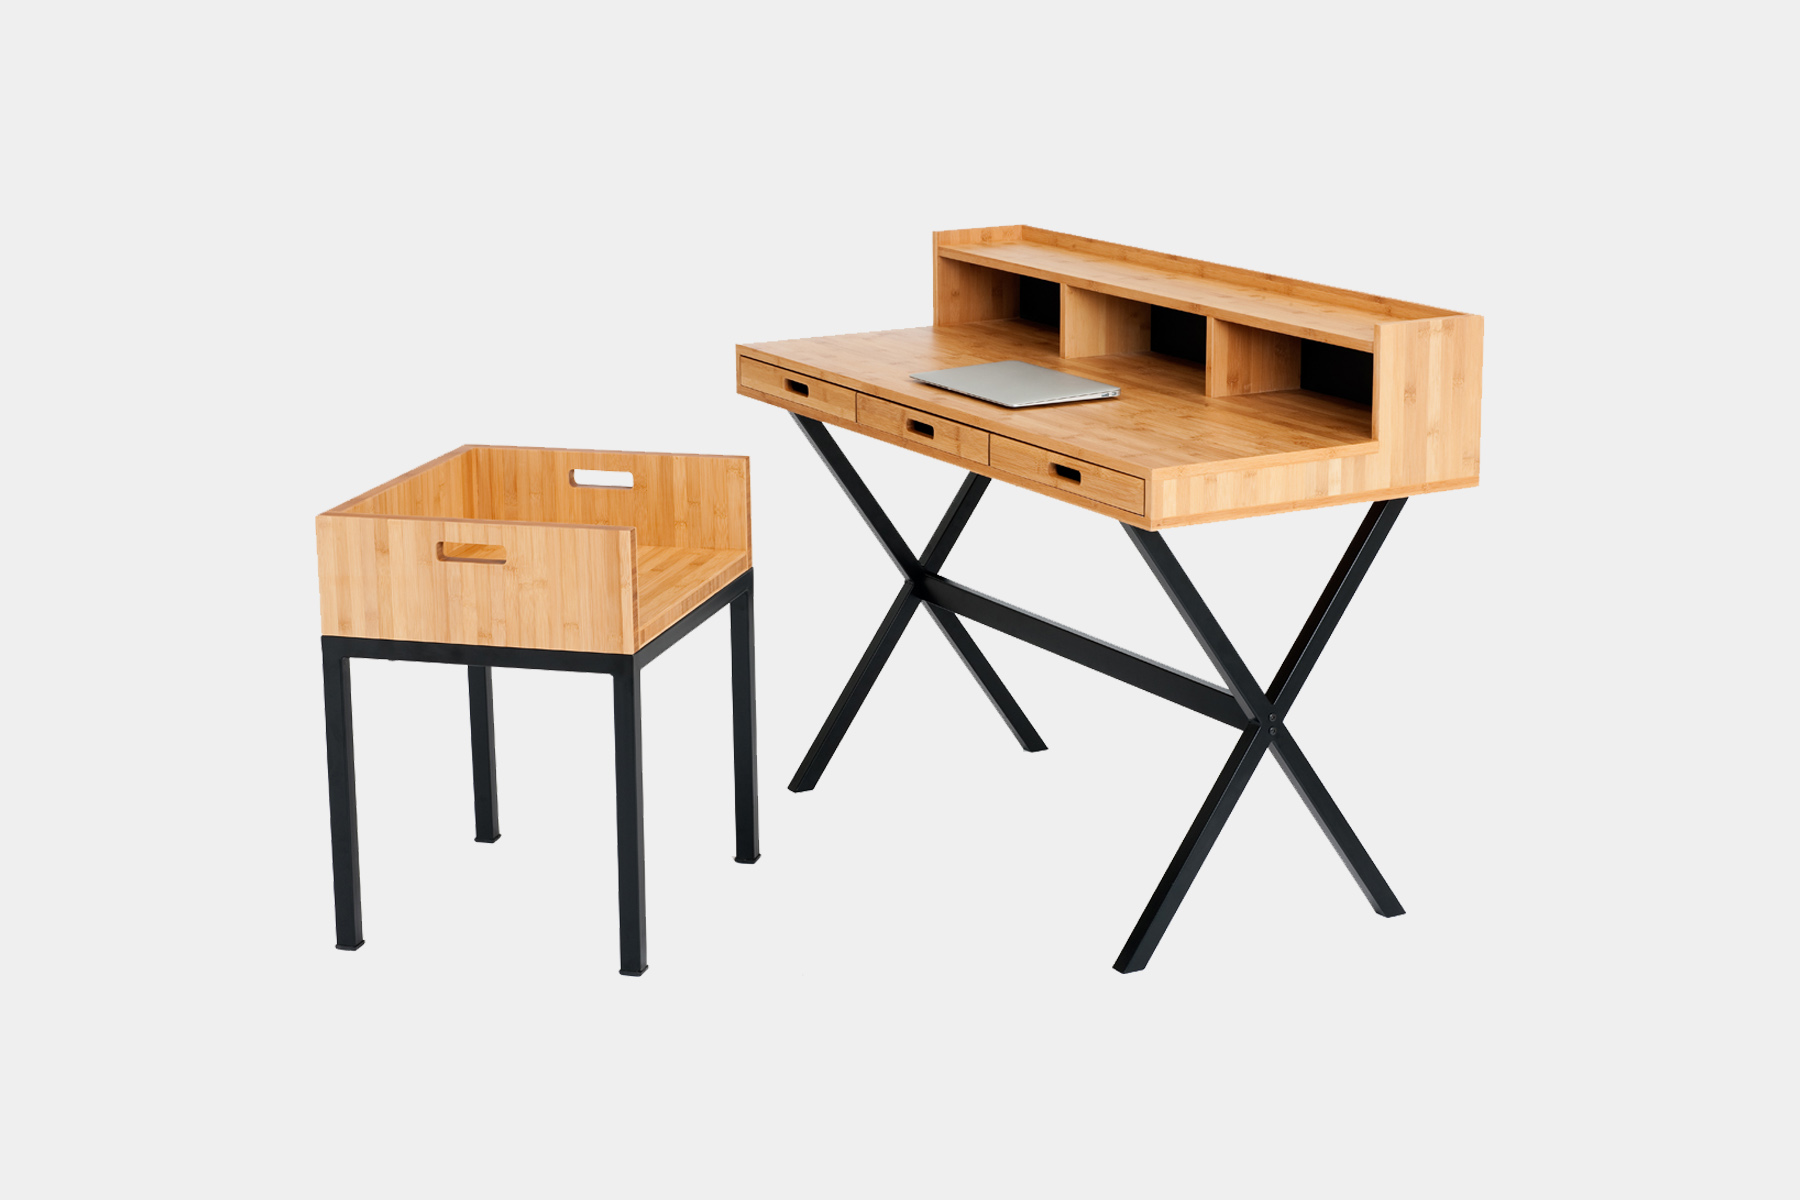 Florence_Watine_Architecte_Designer_Decoratrice_Paris_France_Harto_Design_Bureau_Bambou_HYPPOLITE3